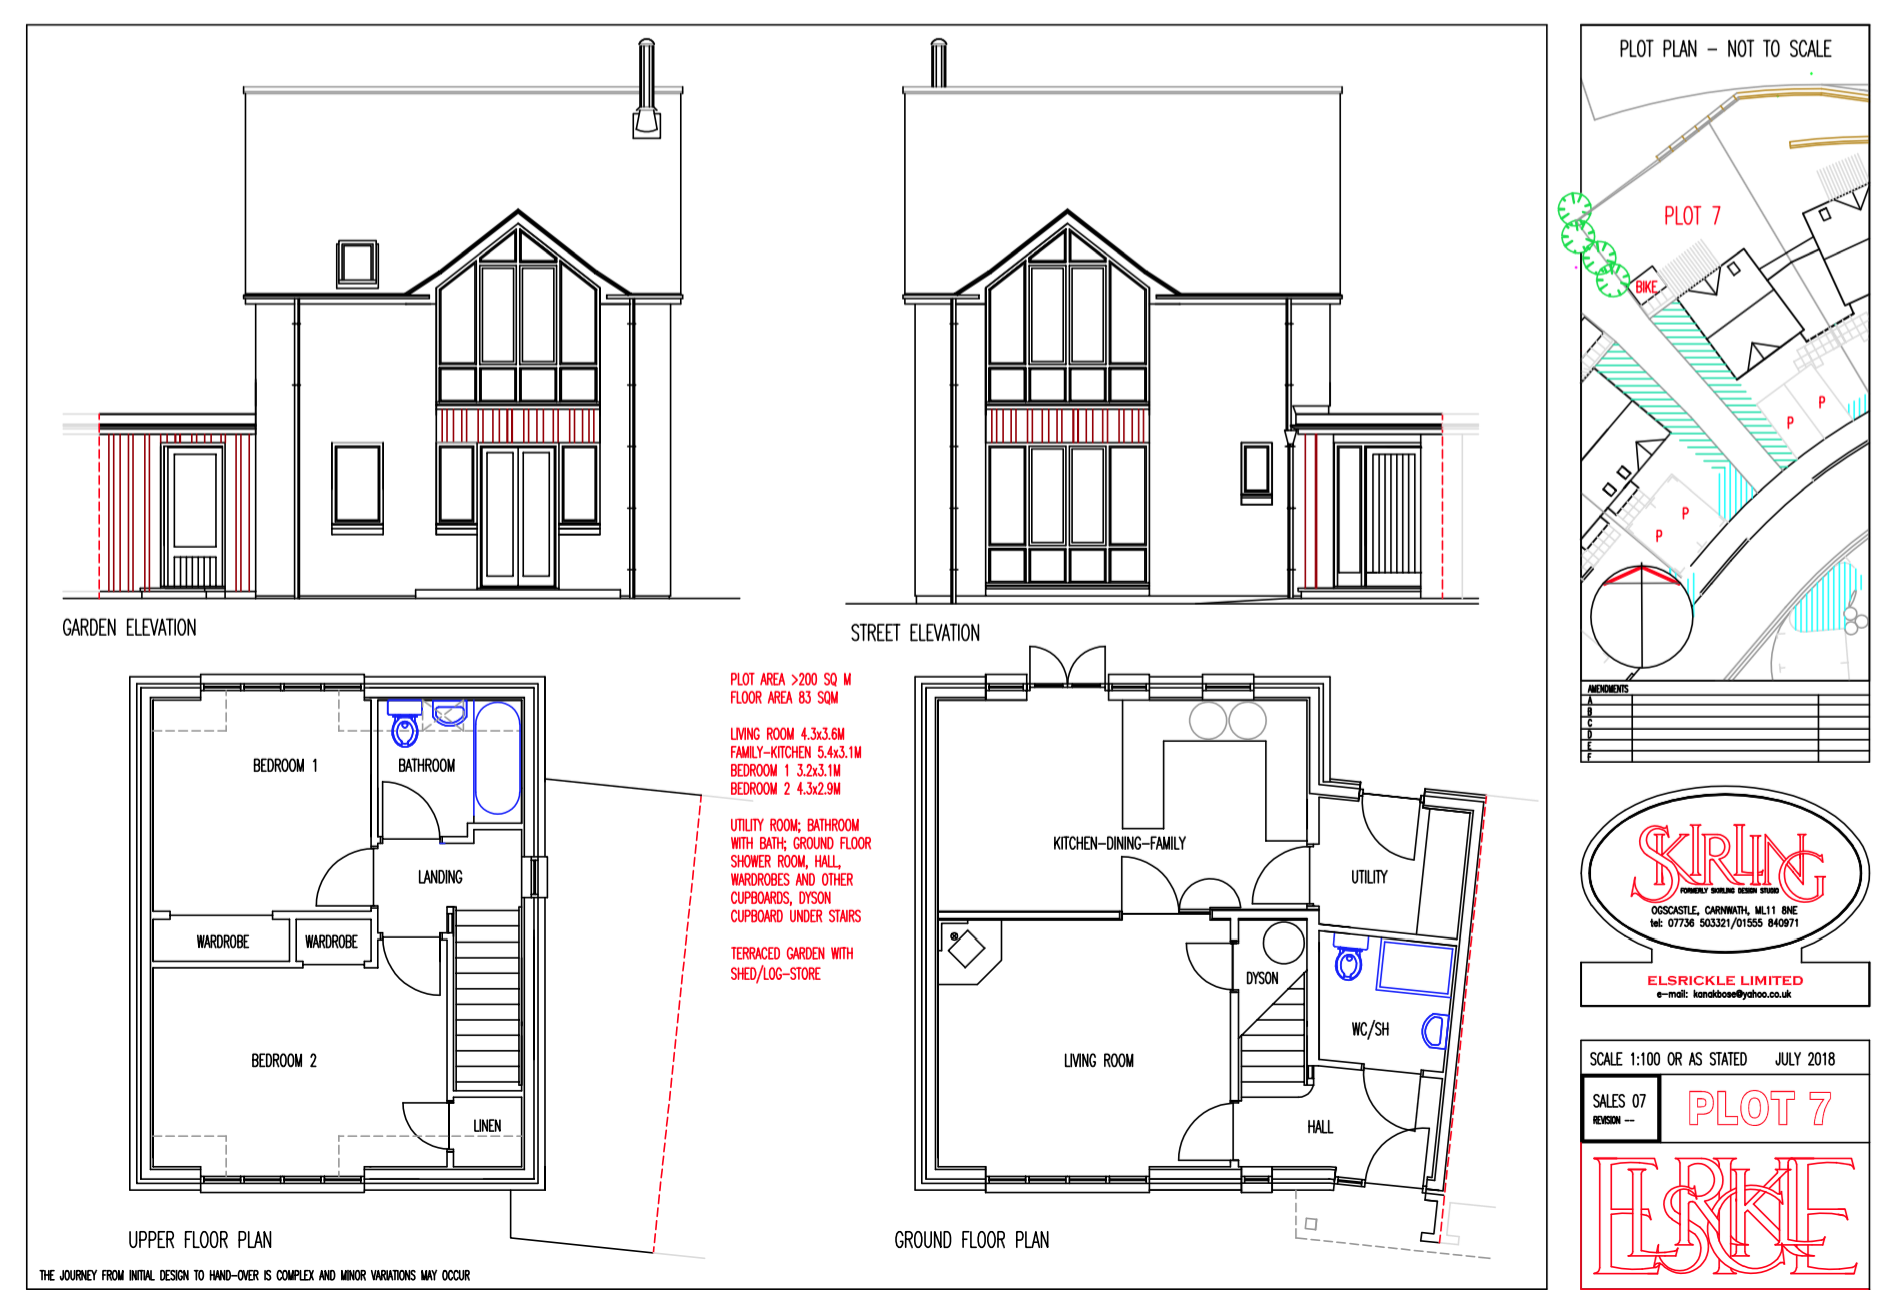 Ellridgehill Eco-friendly Plot 7